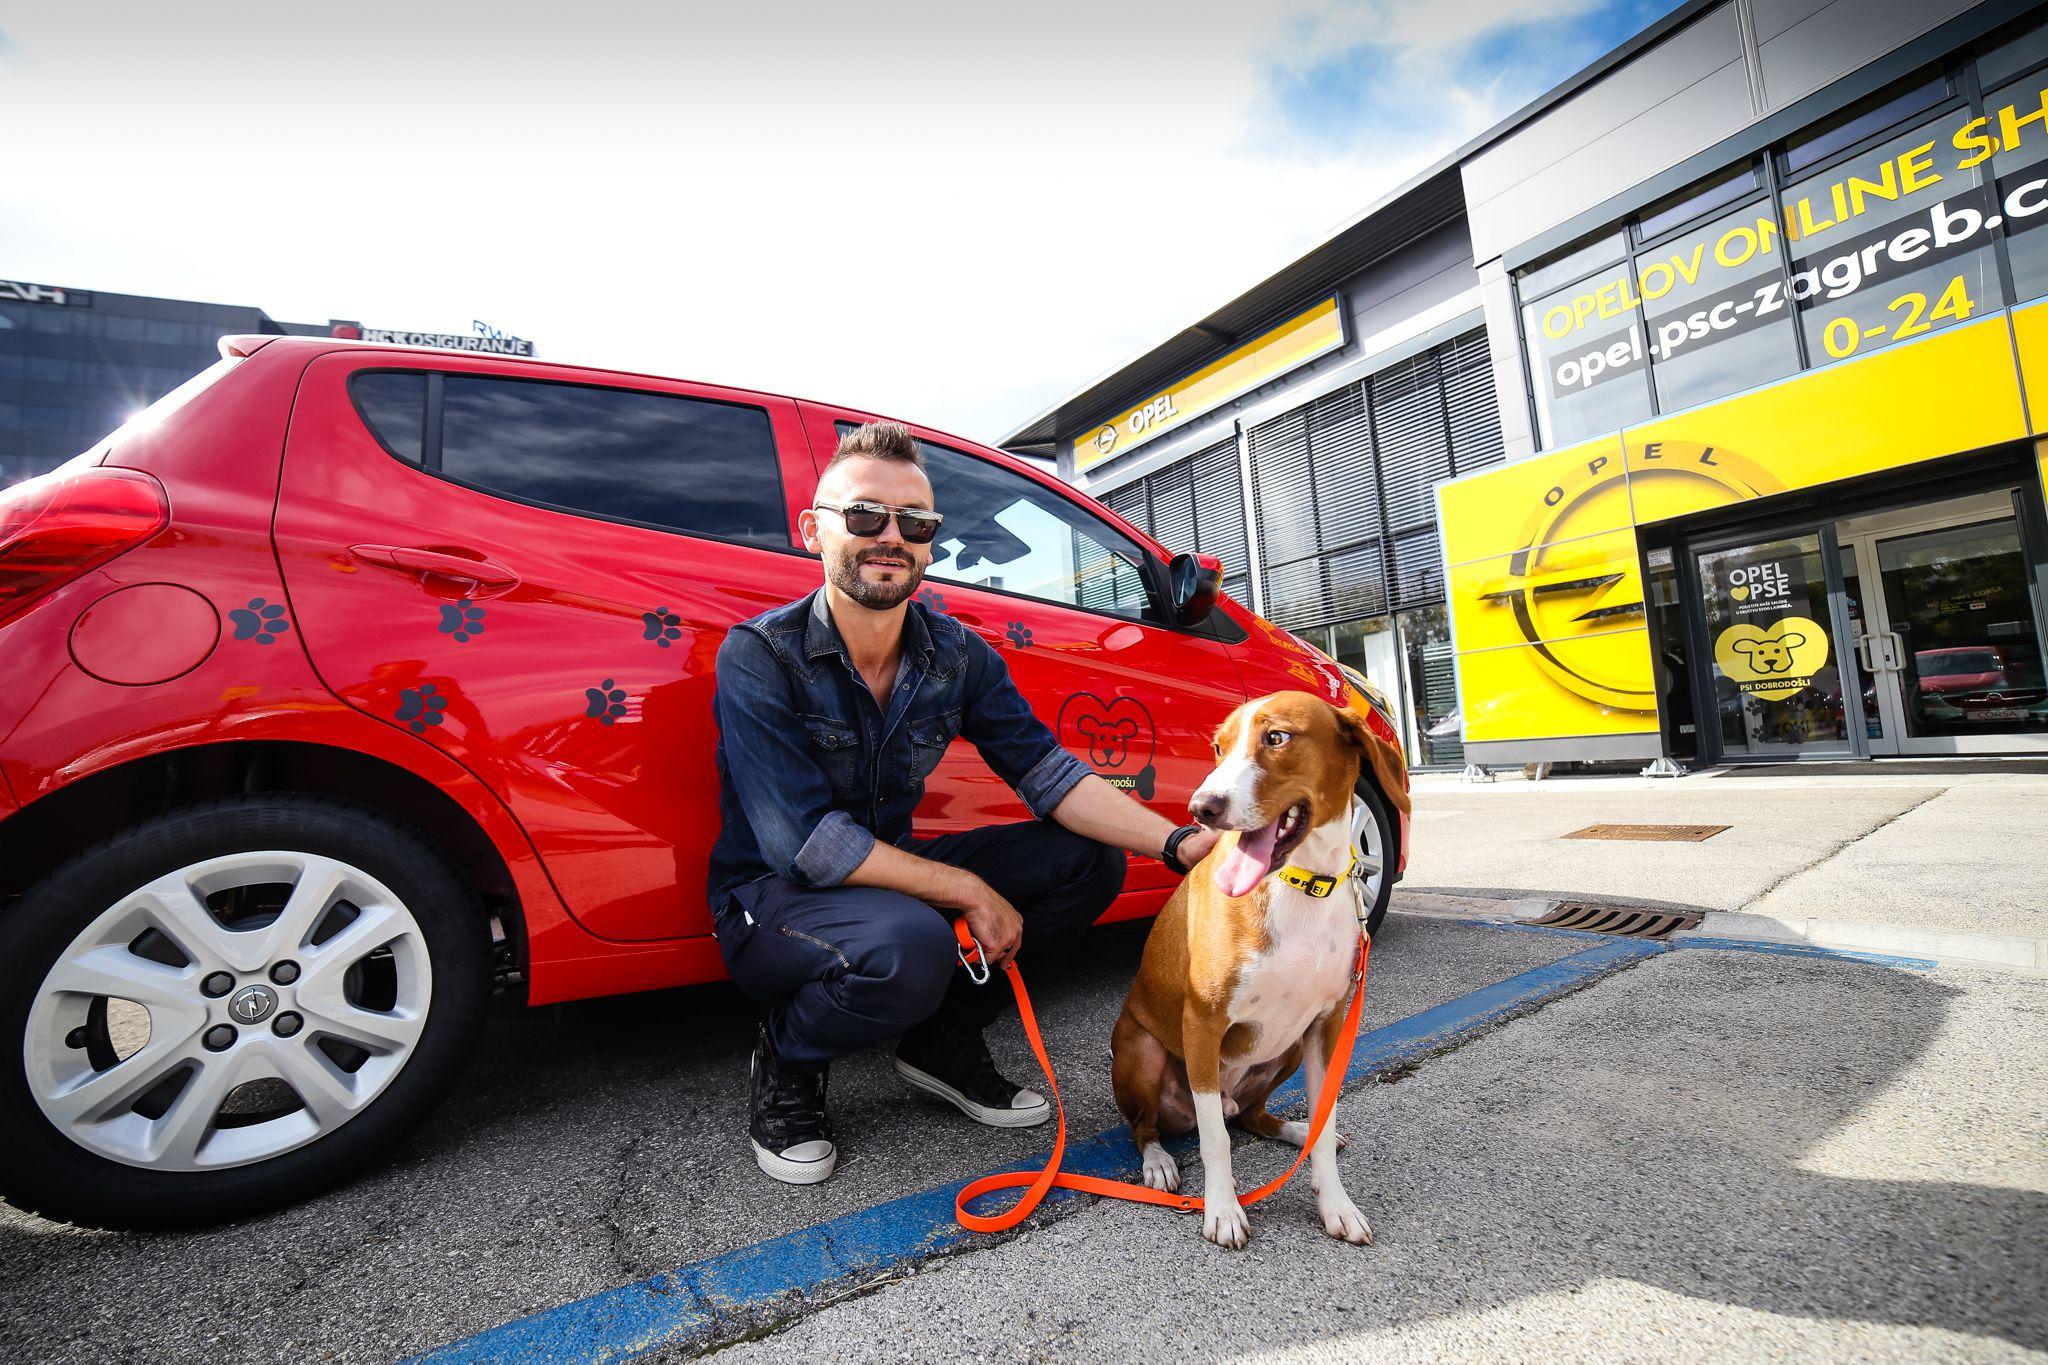 Opel i prvi 'dog - friendly' salon u Hrvatskoj